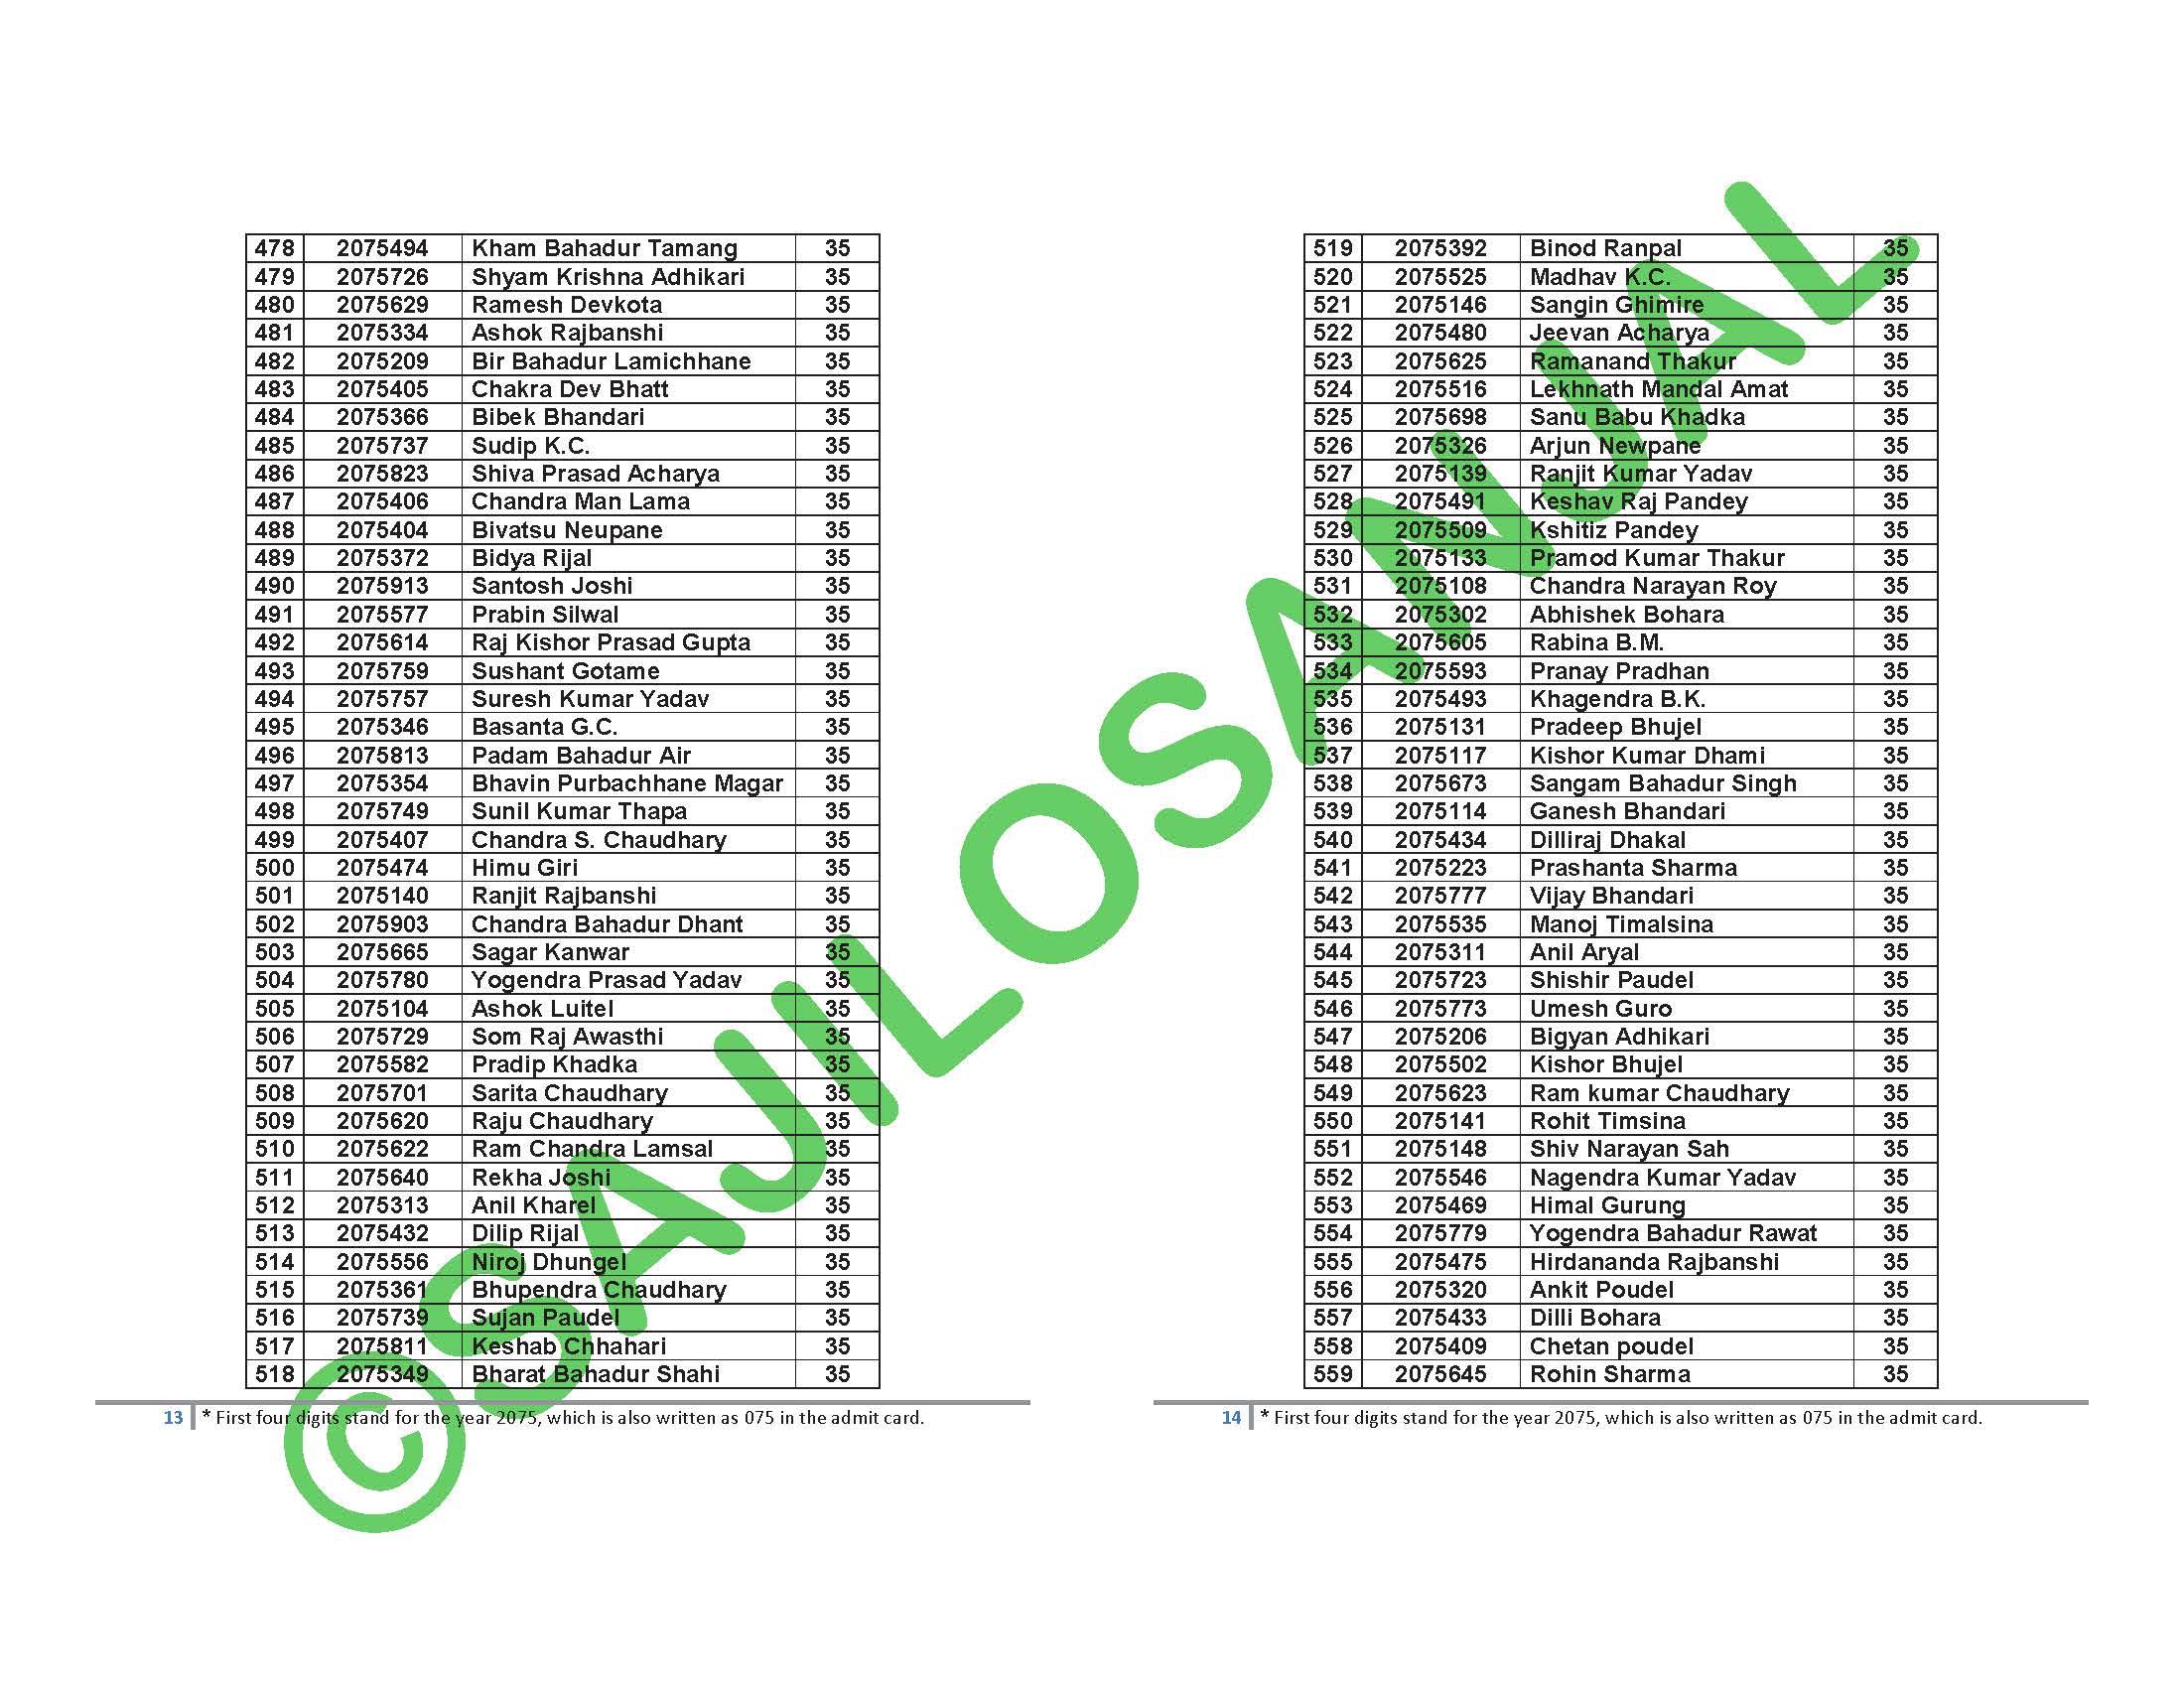 Physics,  Entrance Examination Result 2075,  Tribhuvan University,  Tribhuvan University result,